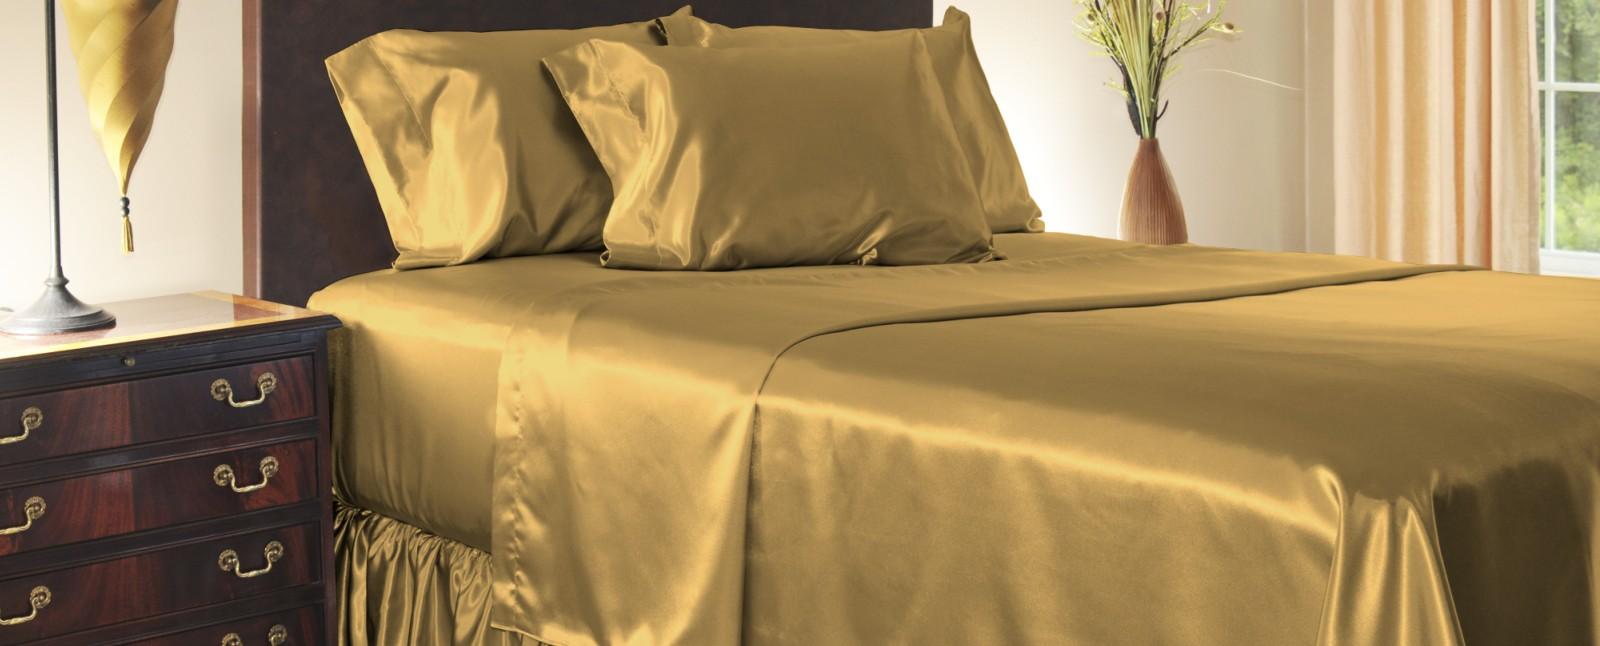 Bridal Satin Bedding